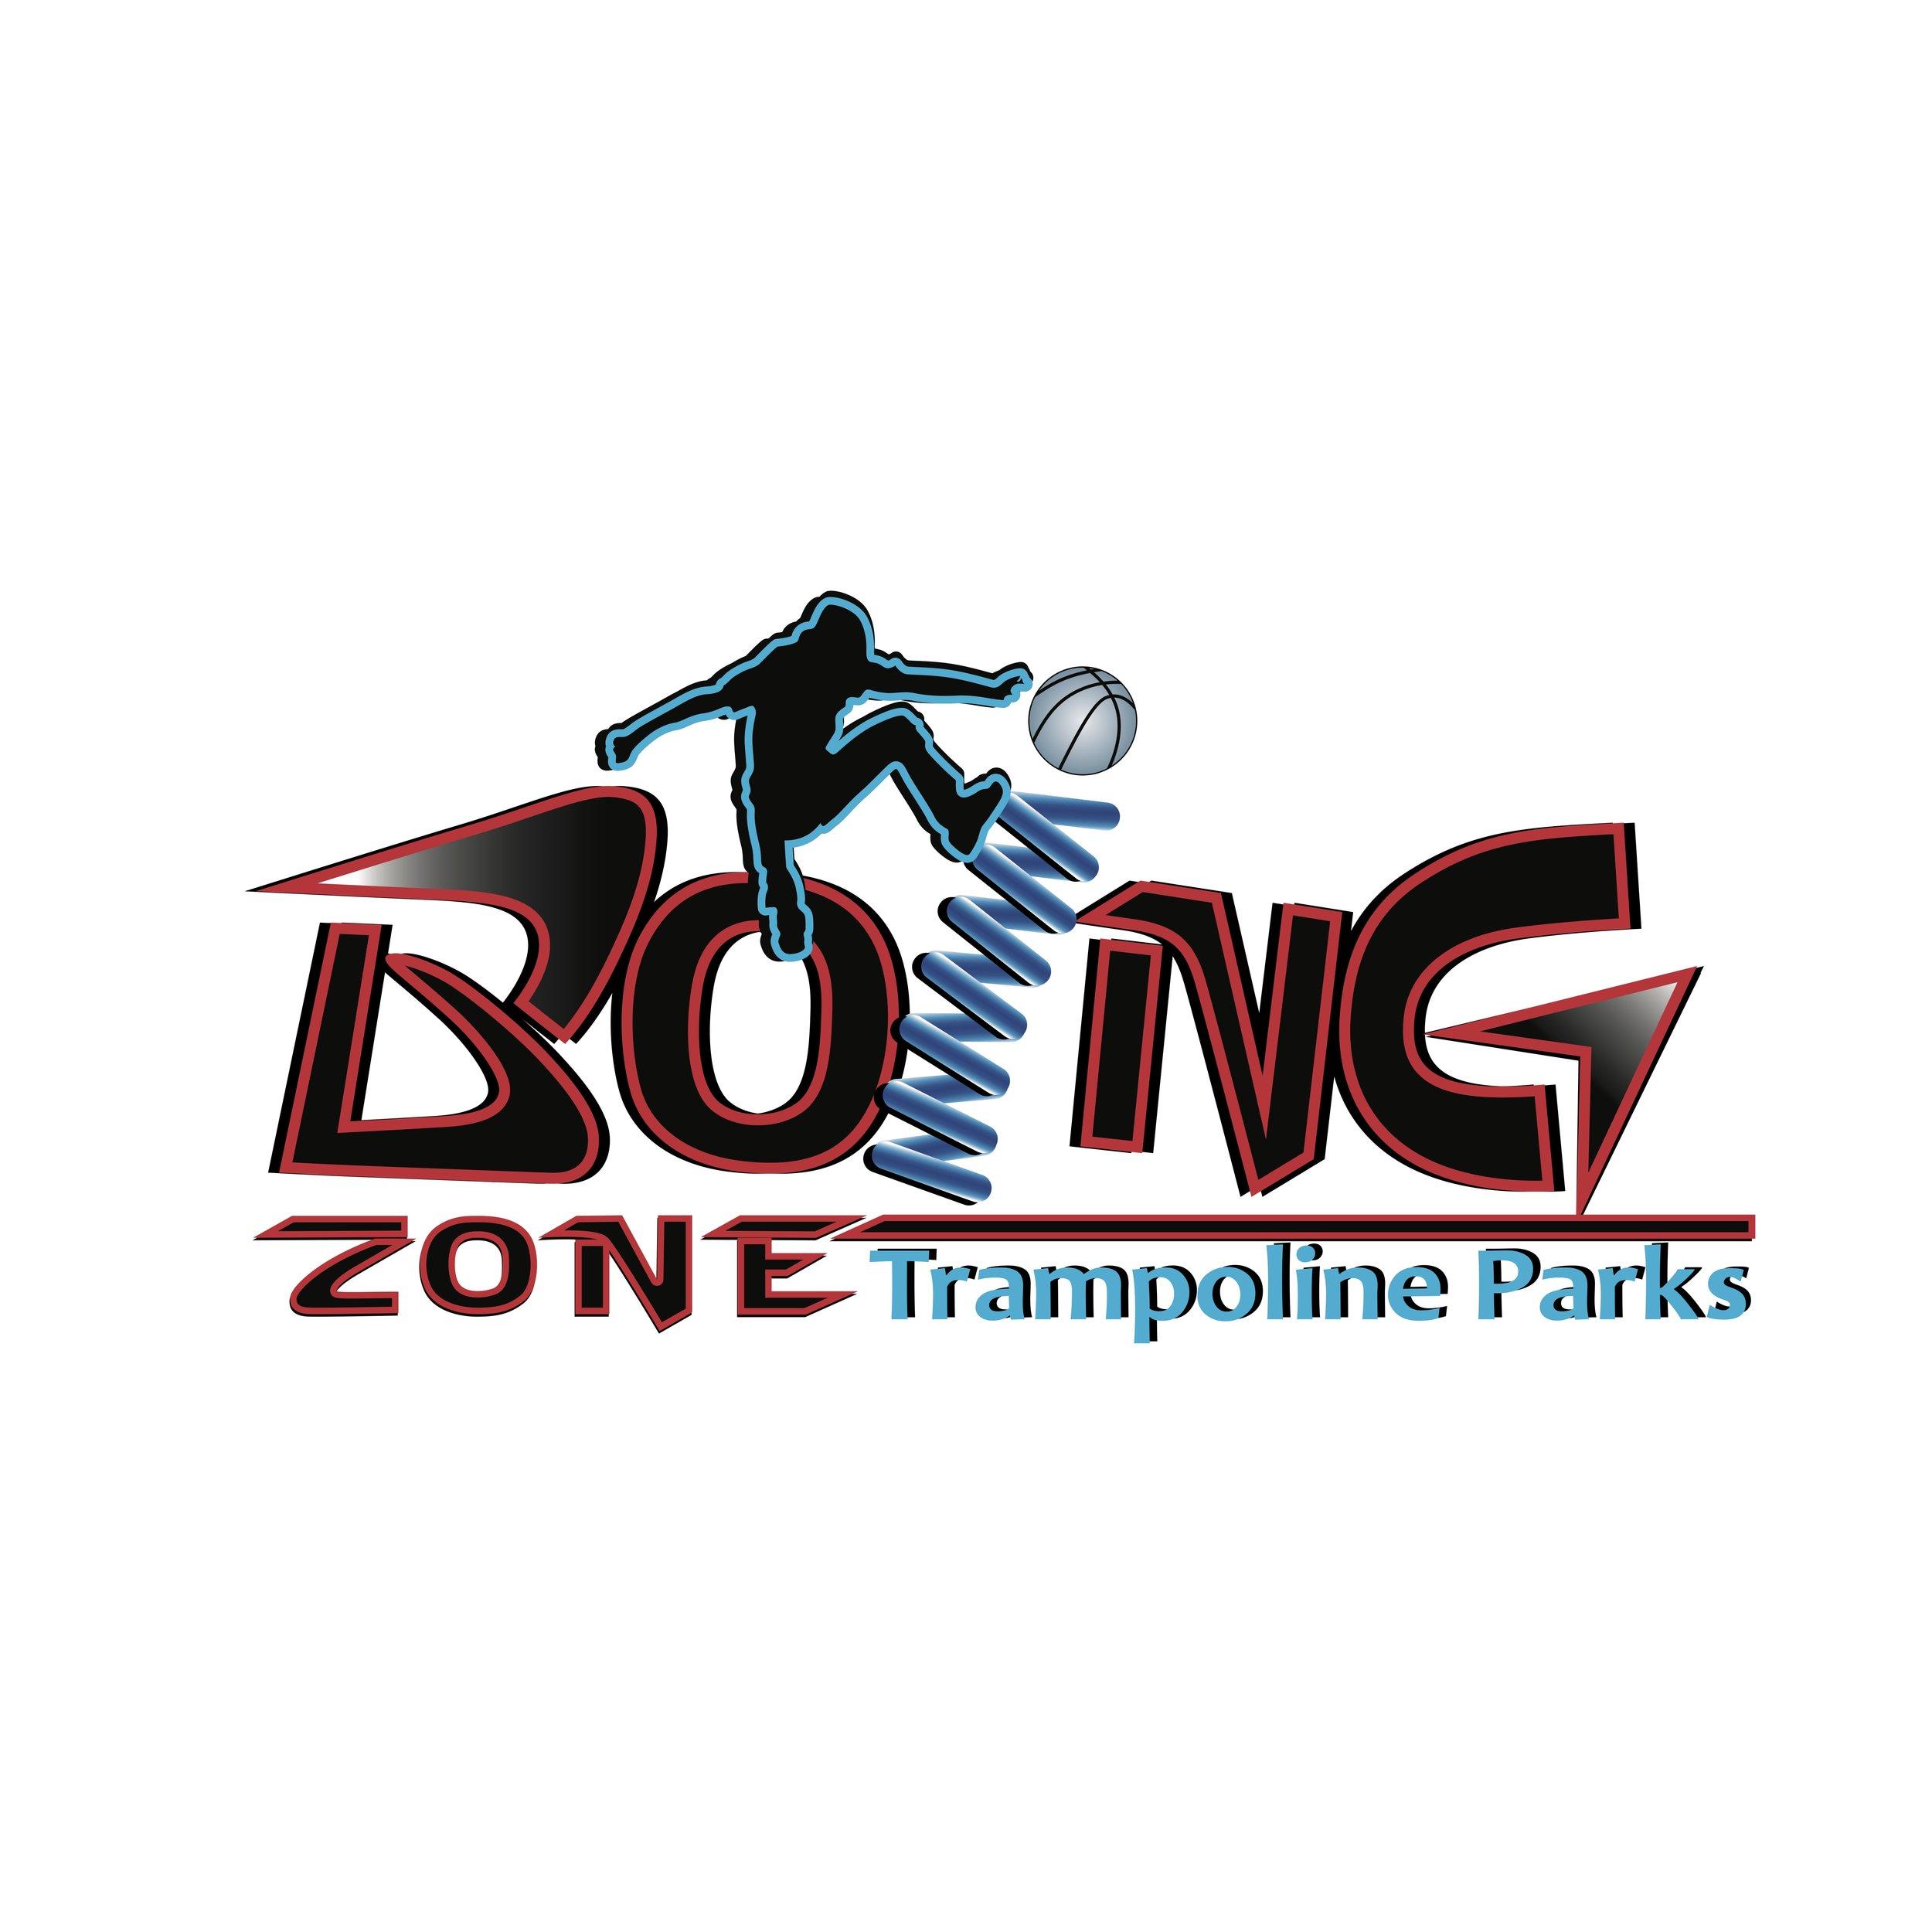 Boing Zone